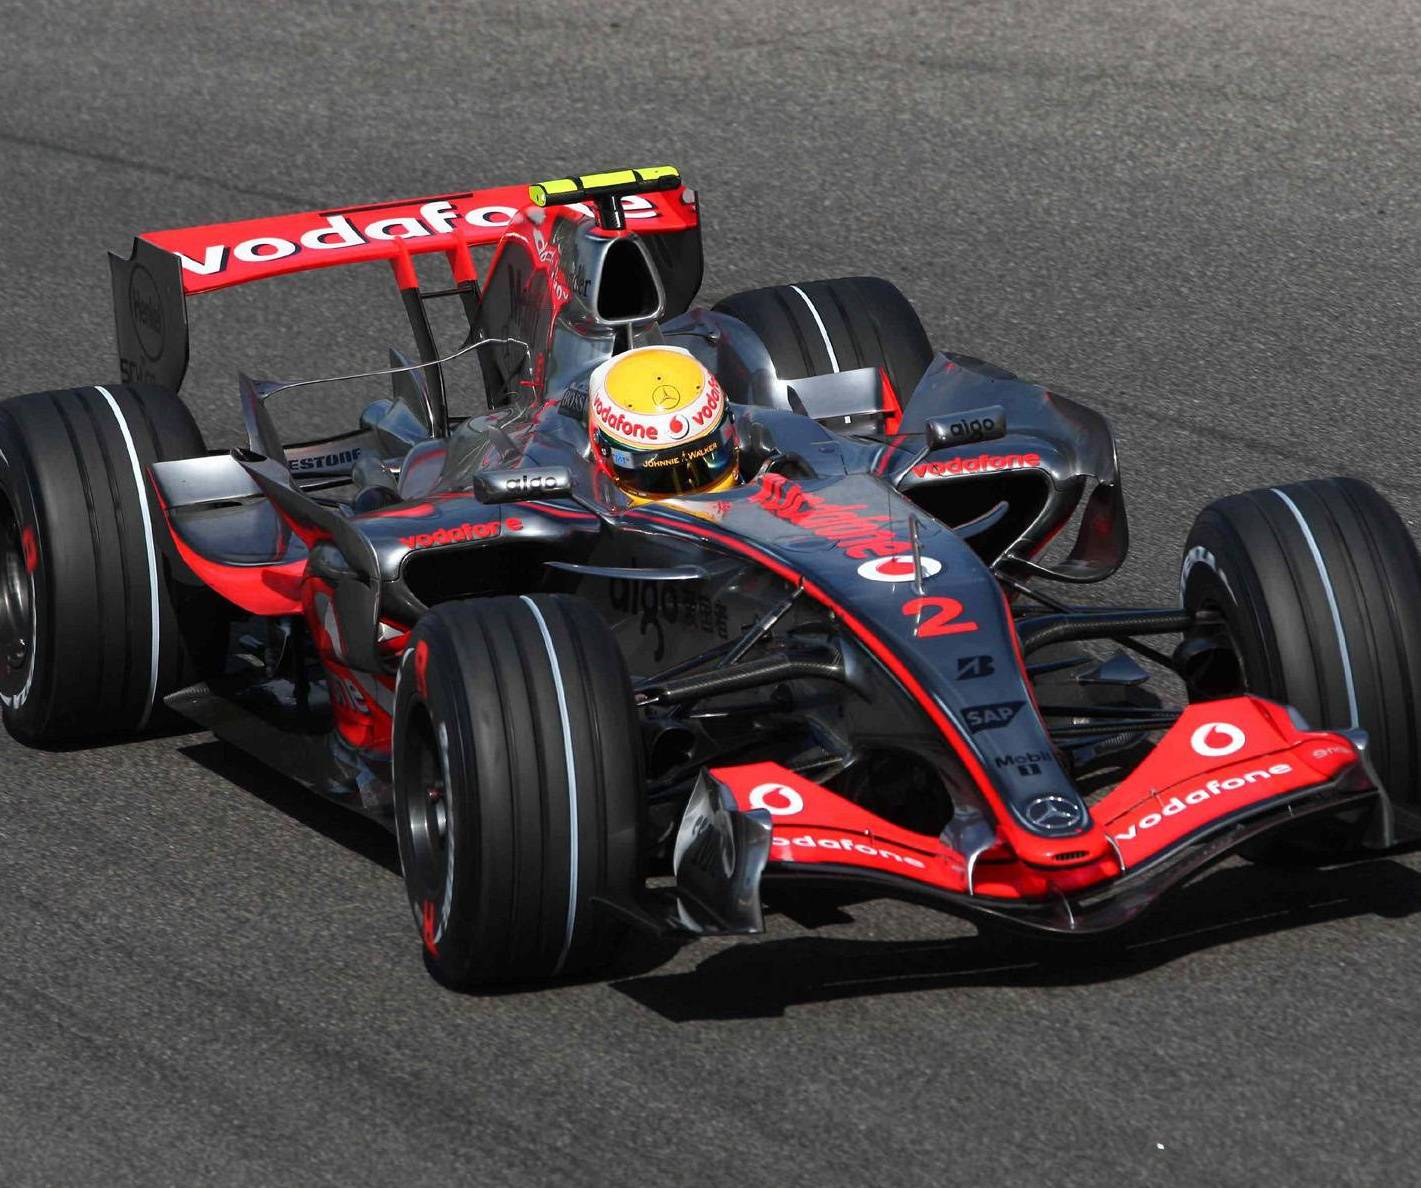 F1 Team Vodafone